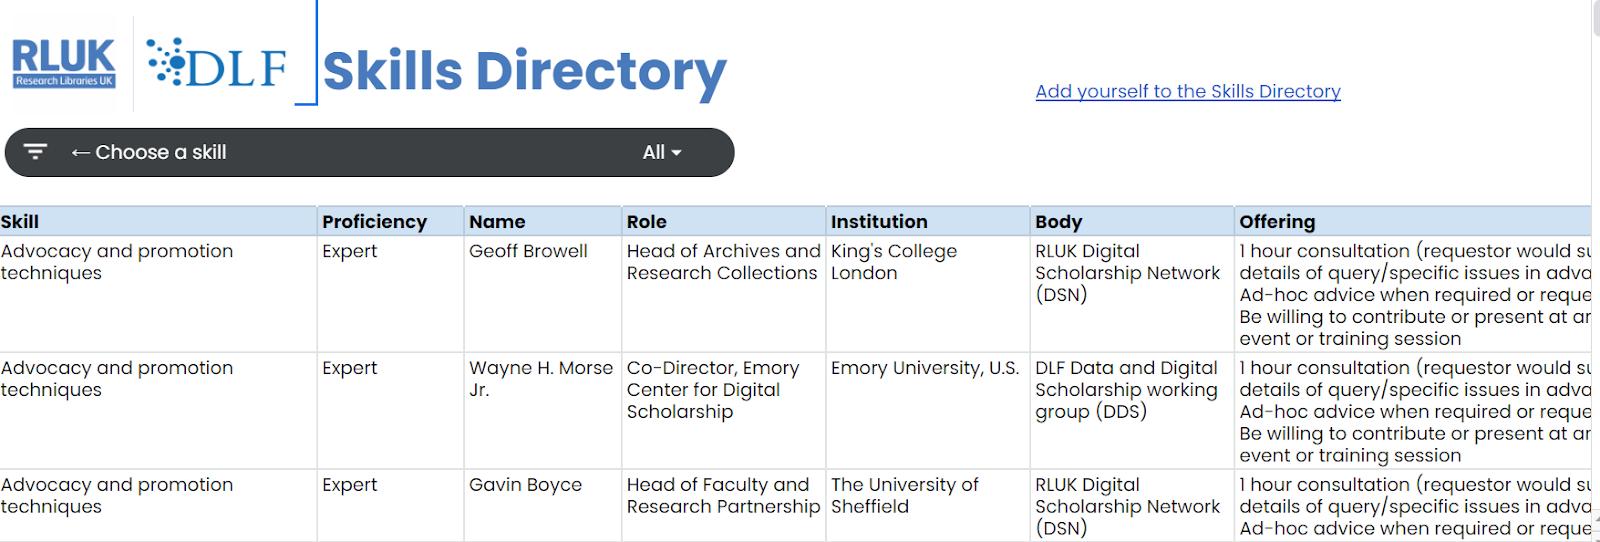 screenshot of the RLUK/DDS skills directory